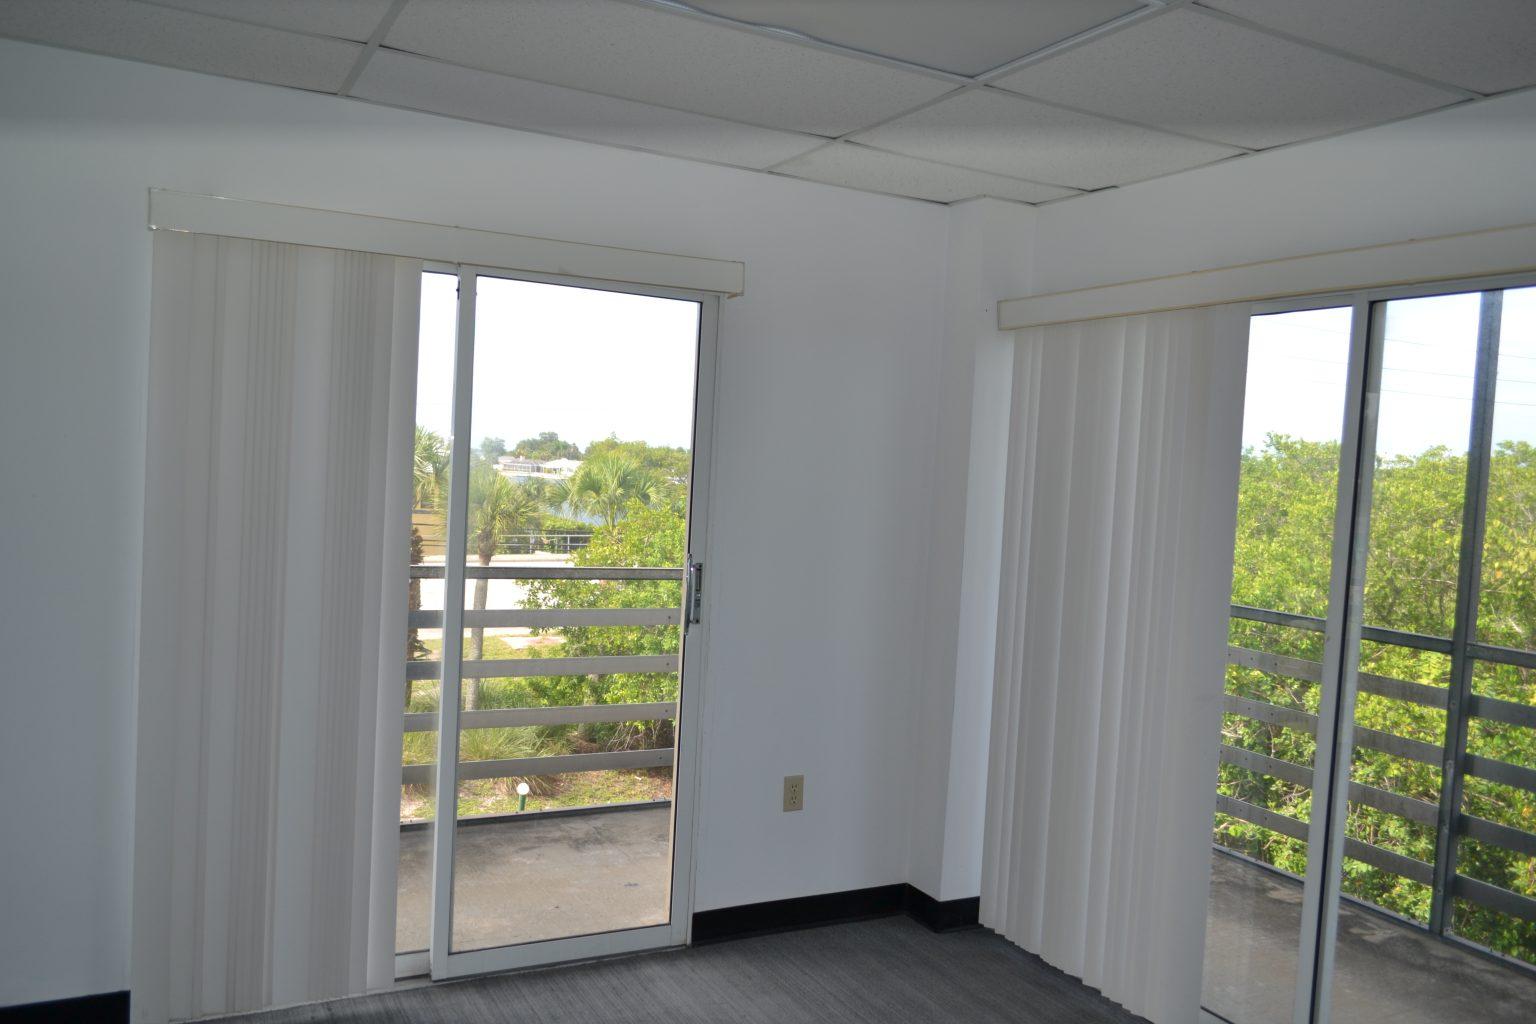 DSC_0840 - West Coast Property